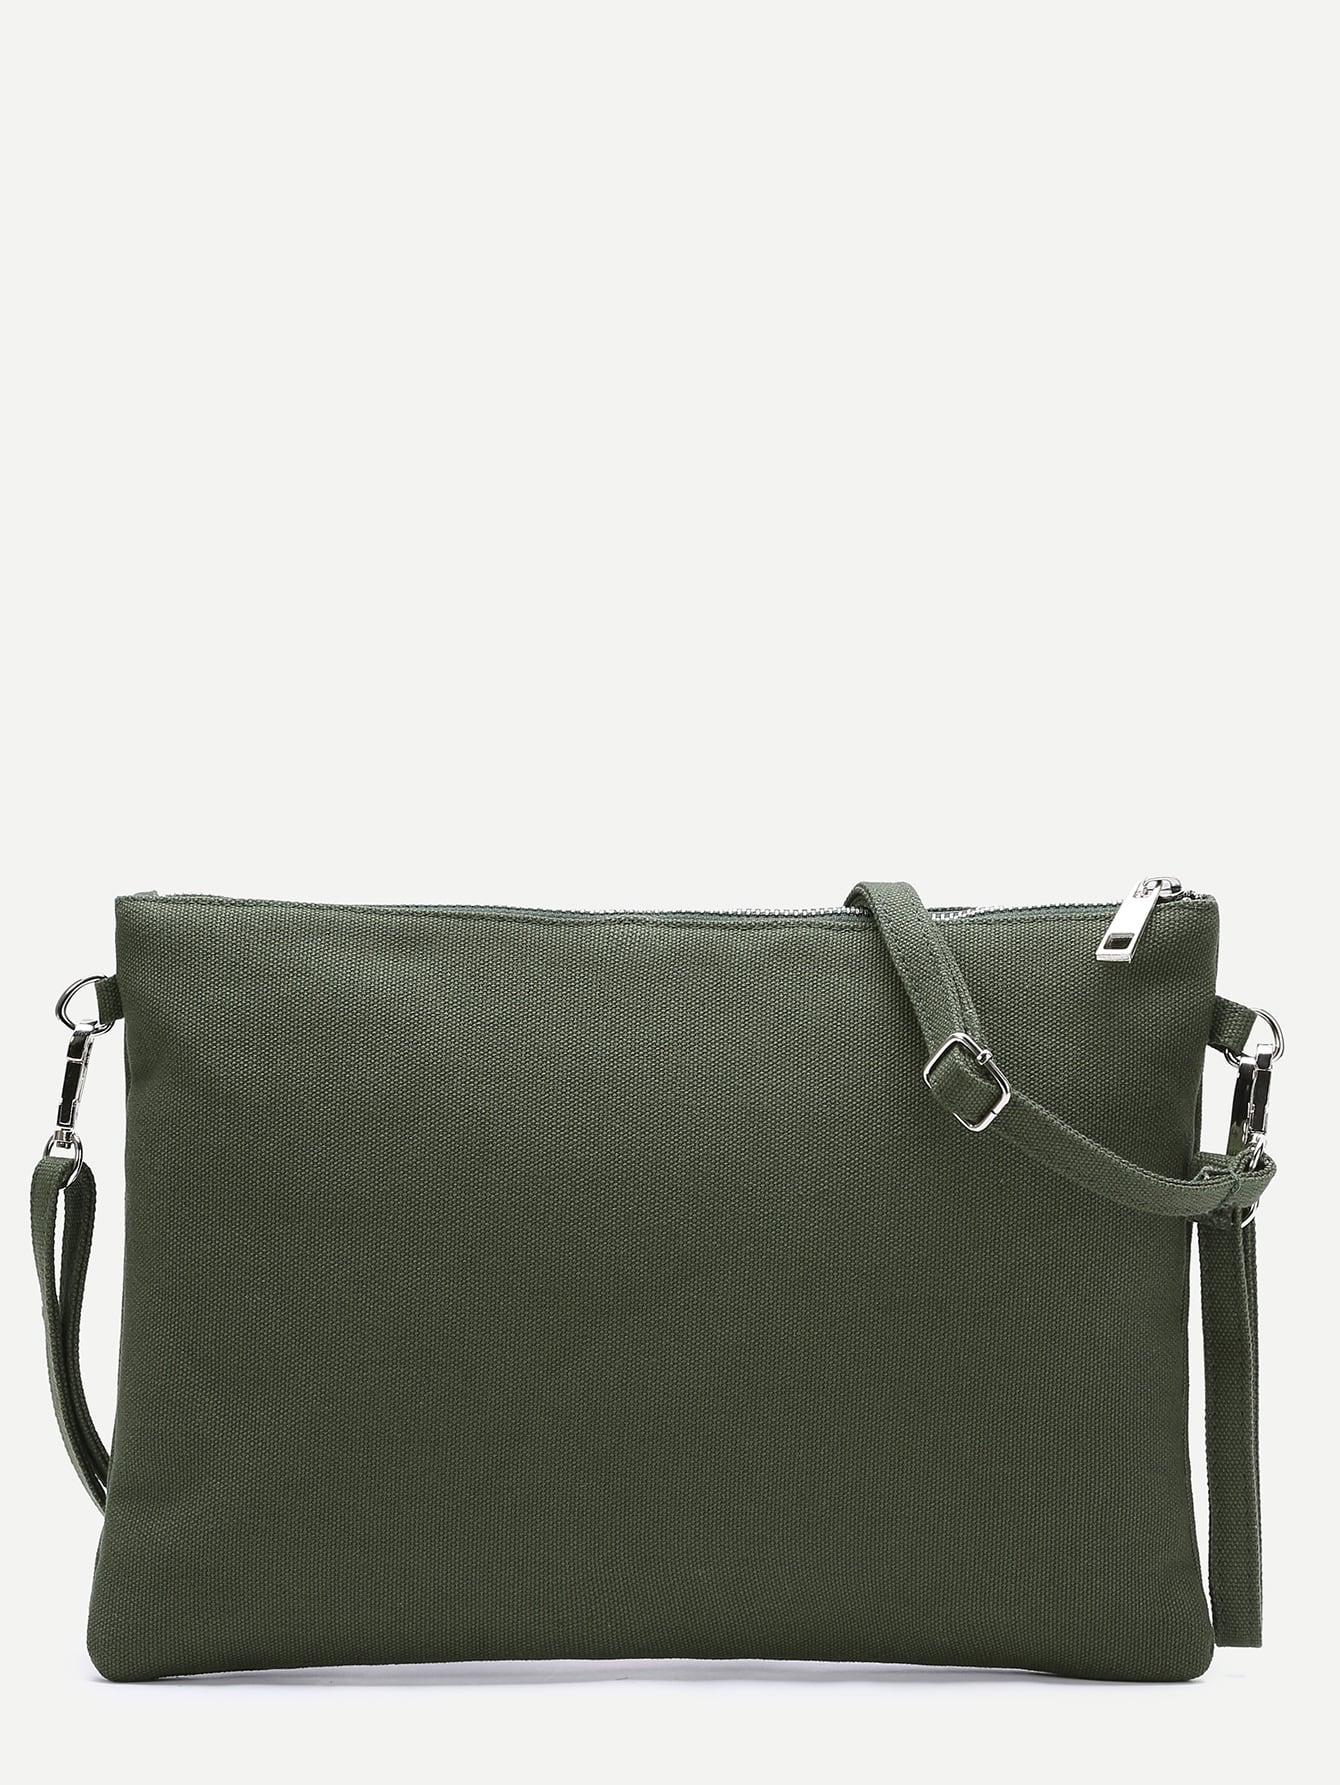 bag161228905_2